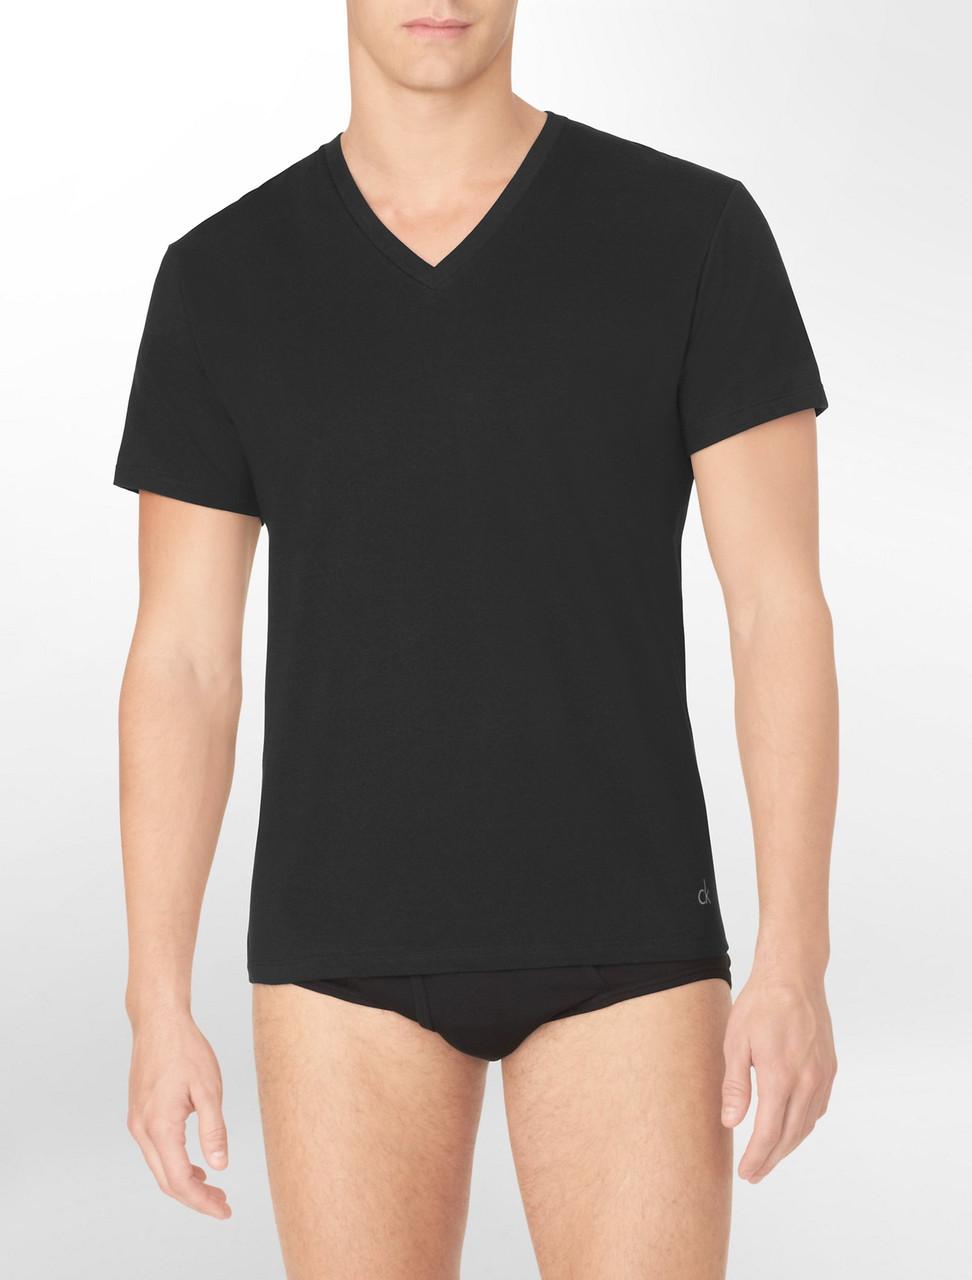 CALVIN KLEIN CK Underwear Men Basic Tee 3 Pack Classic Fit V